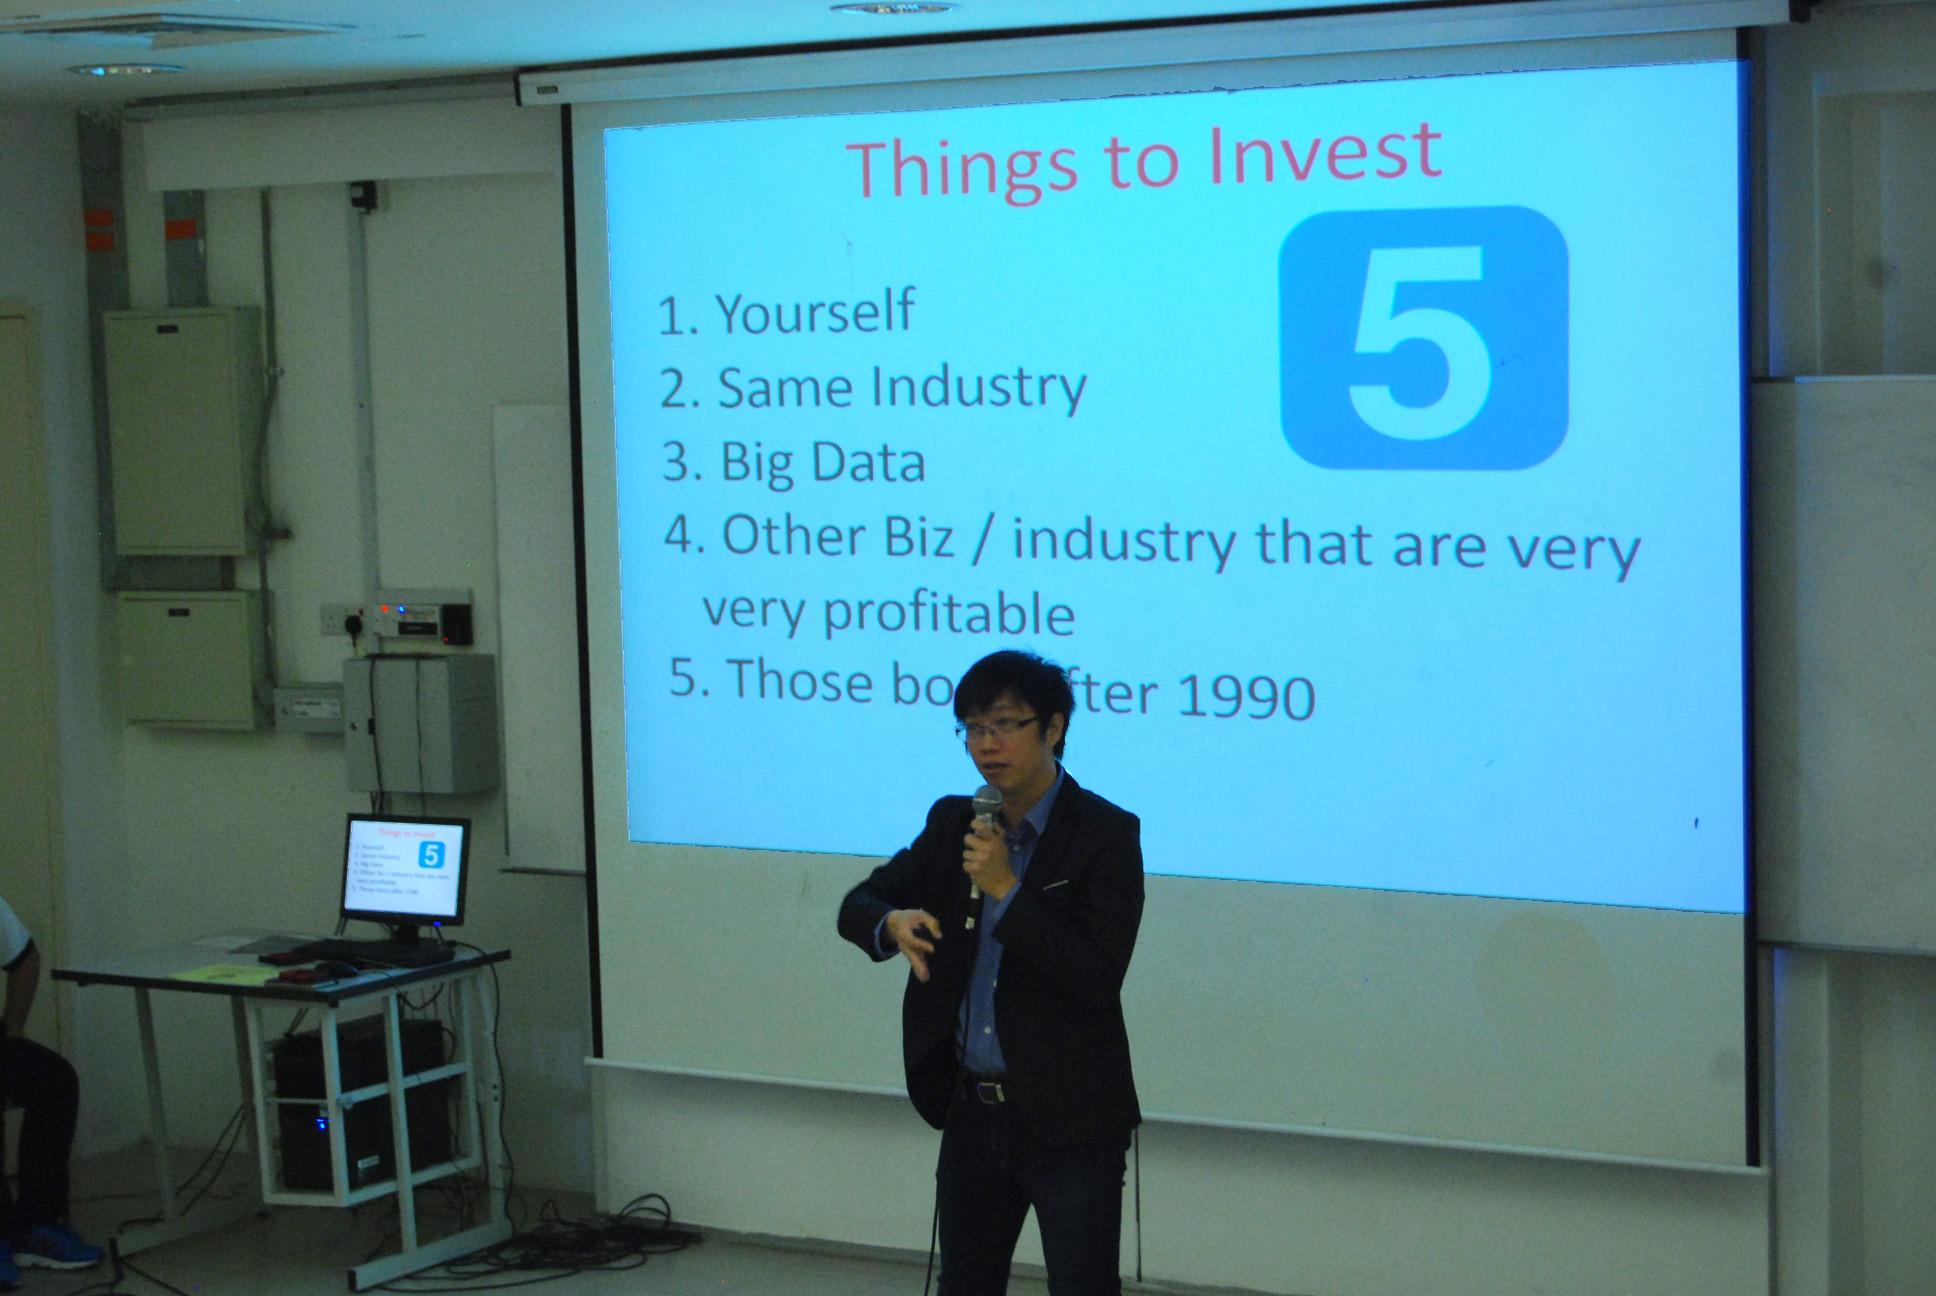 Jacky Cheng Hock Eu during the talk